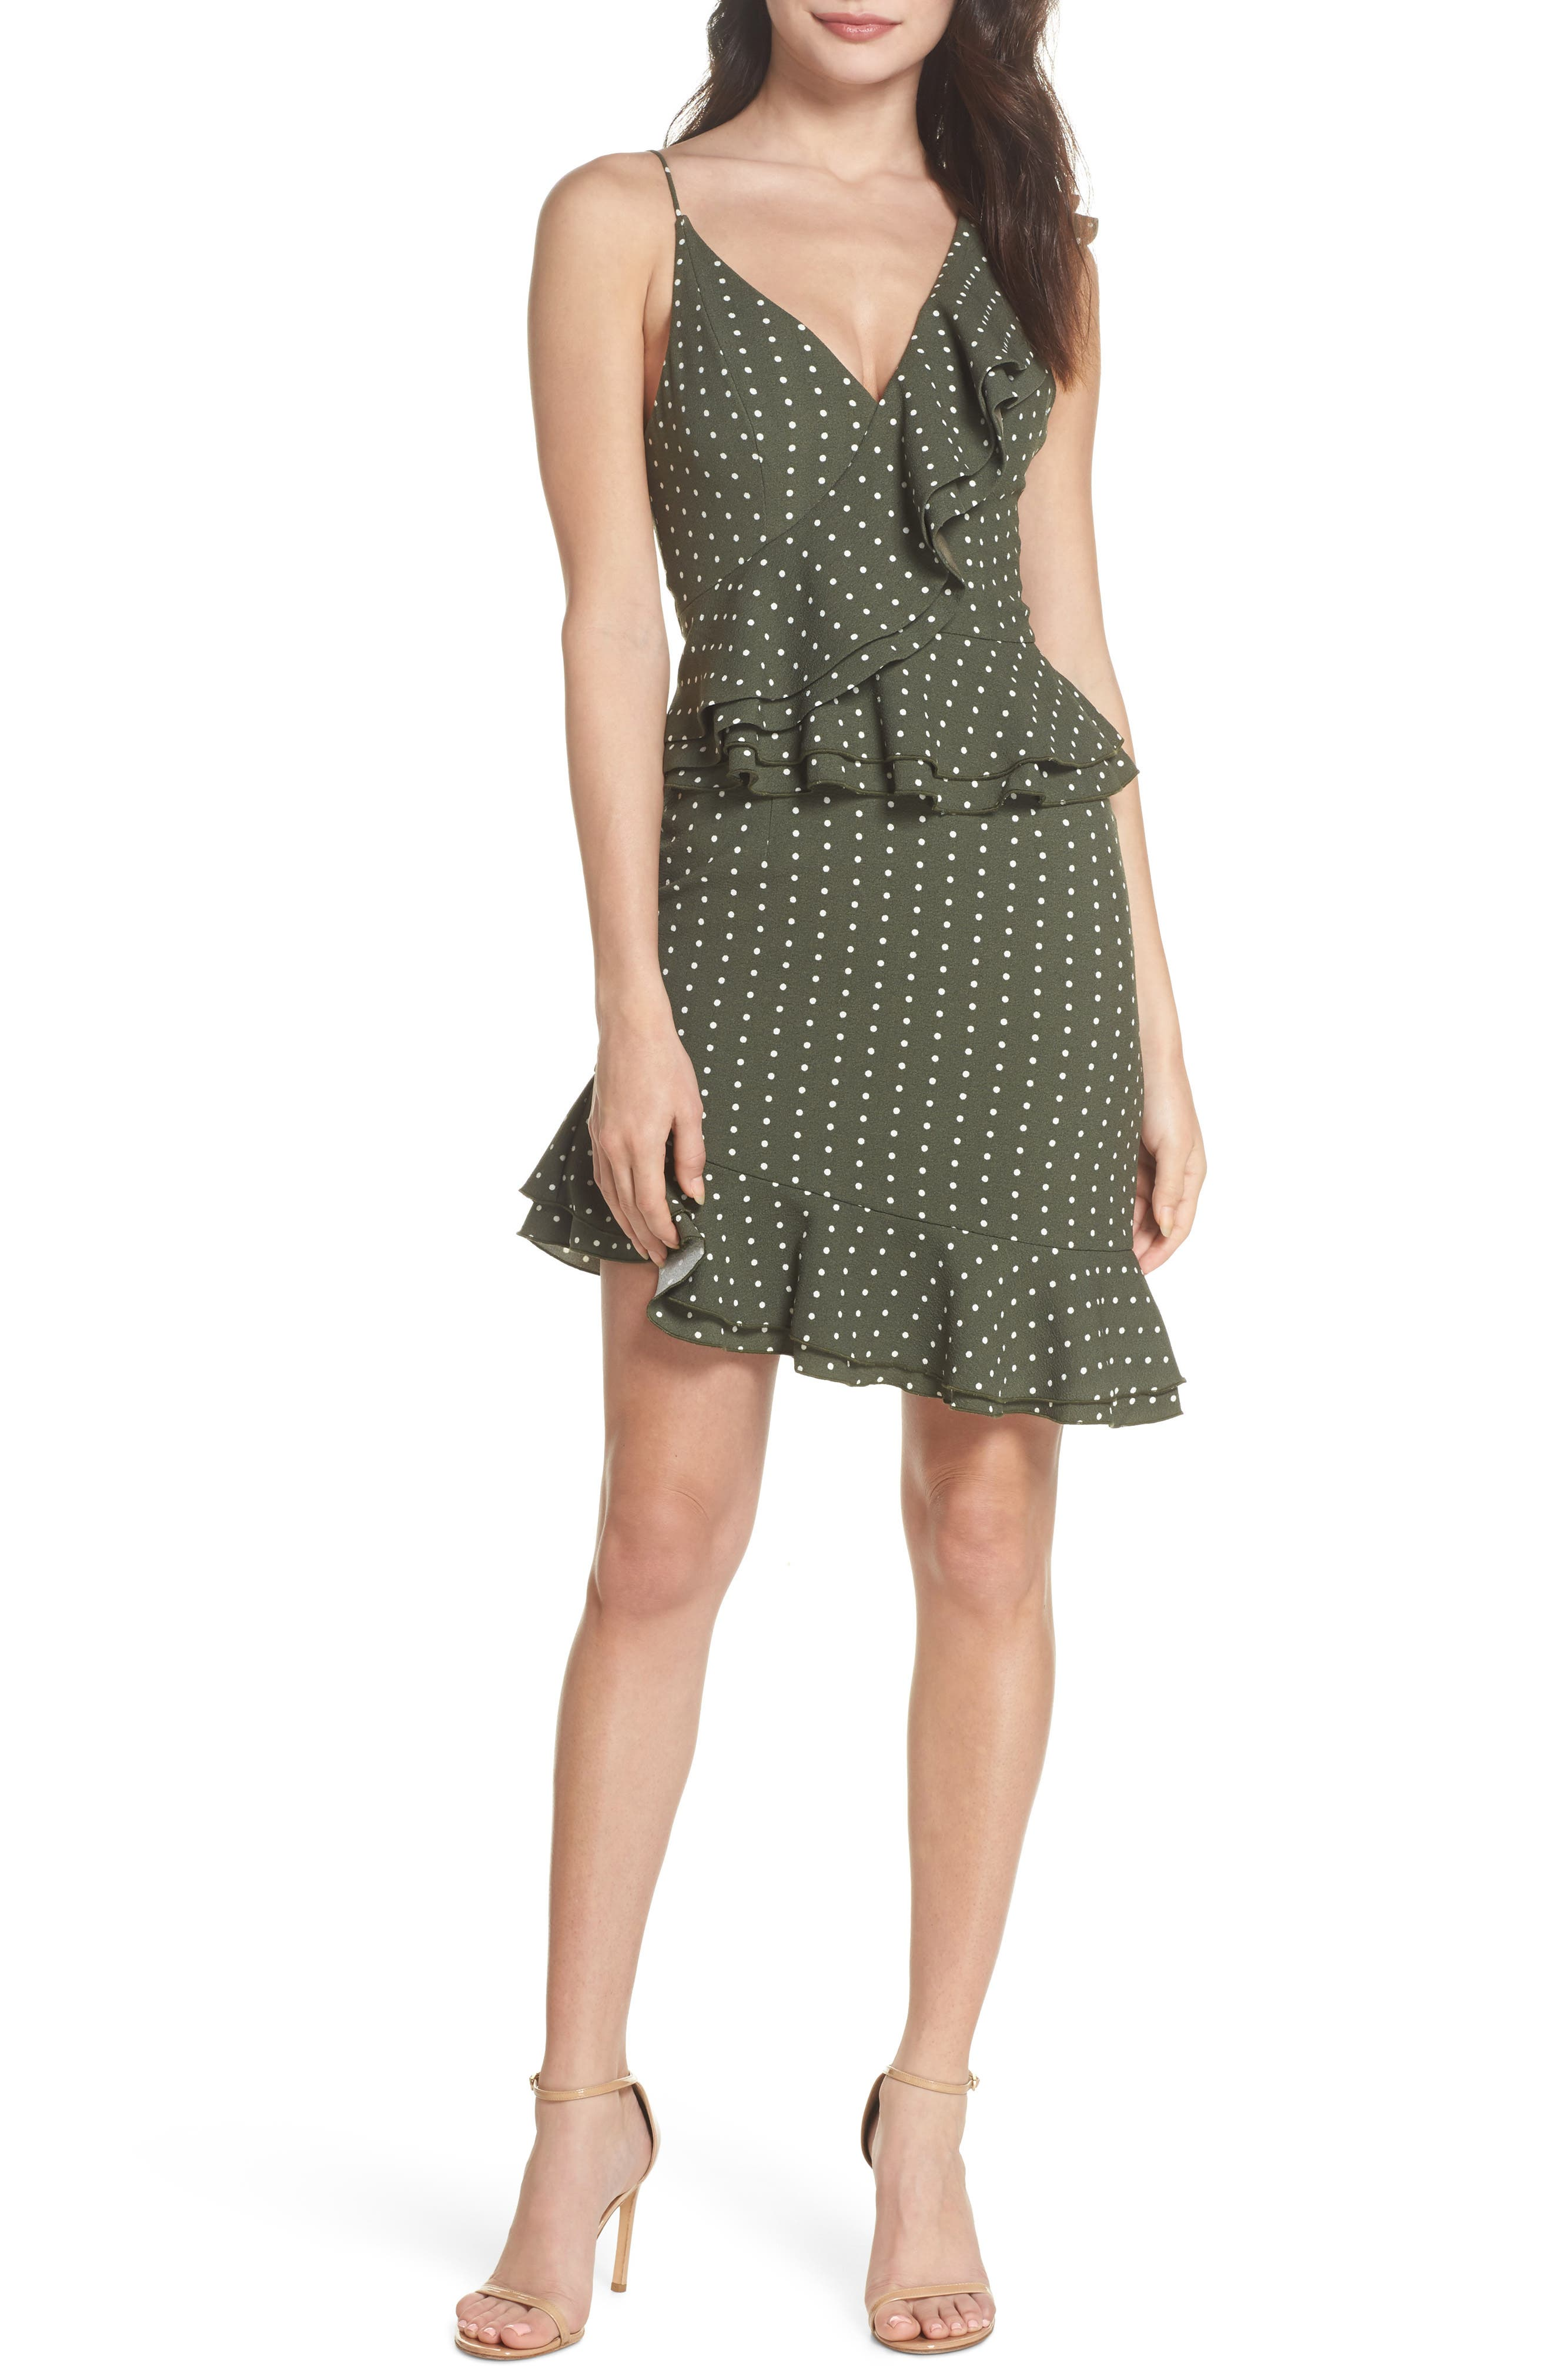 C/MEO Collective Entice Dot Ruffle Trim Dress